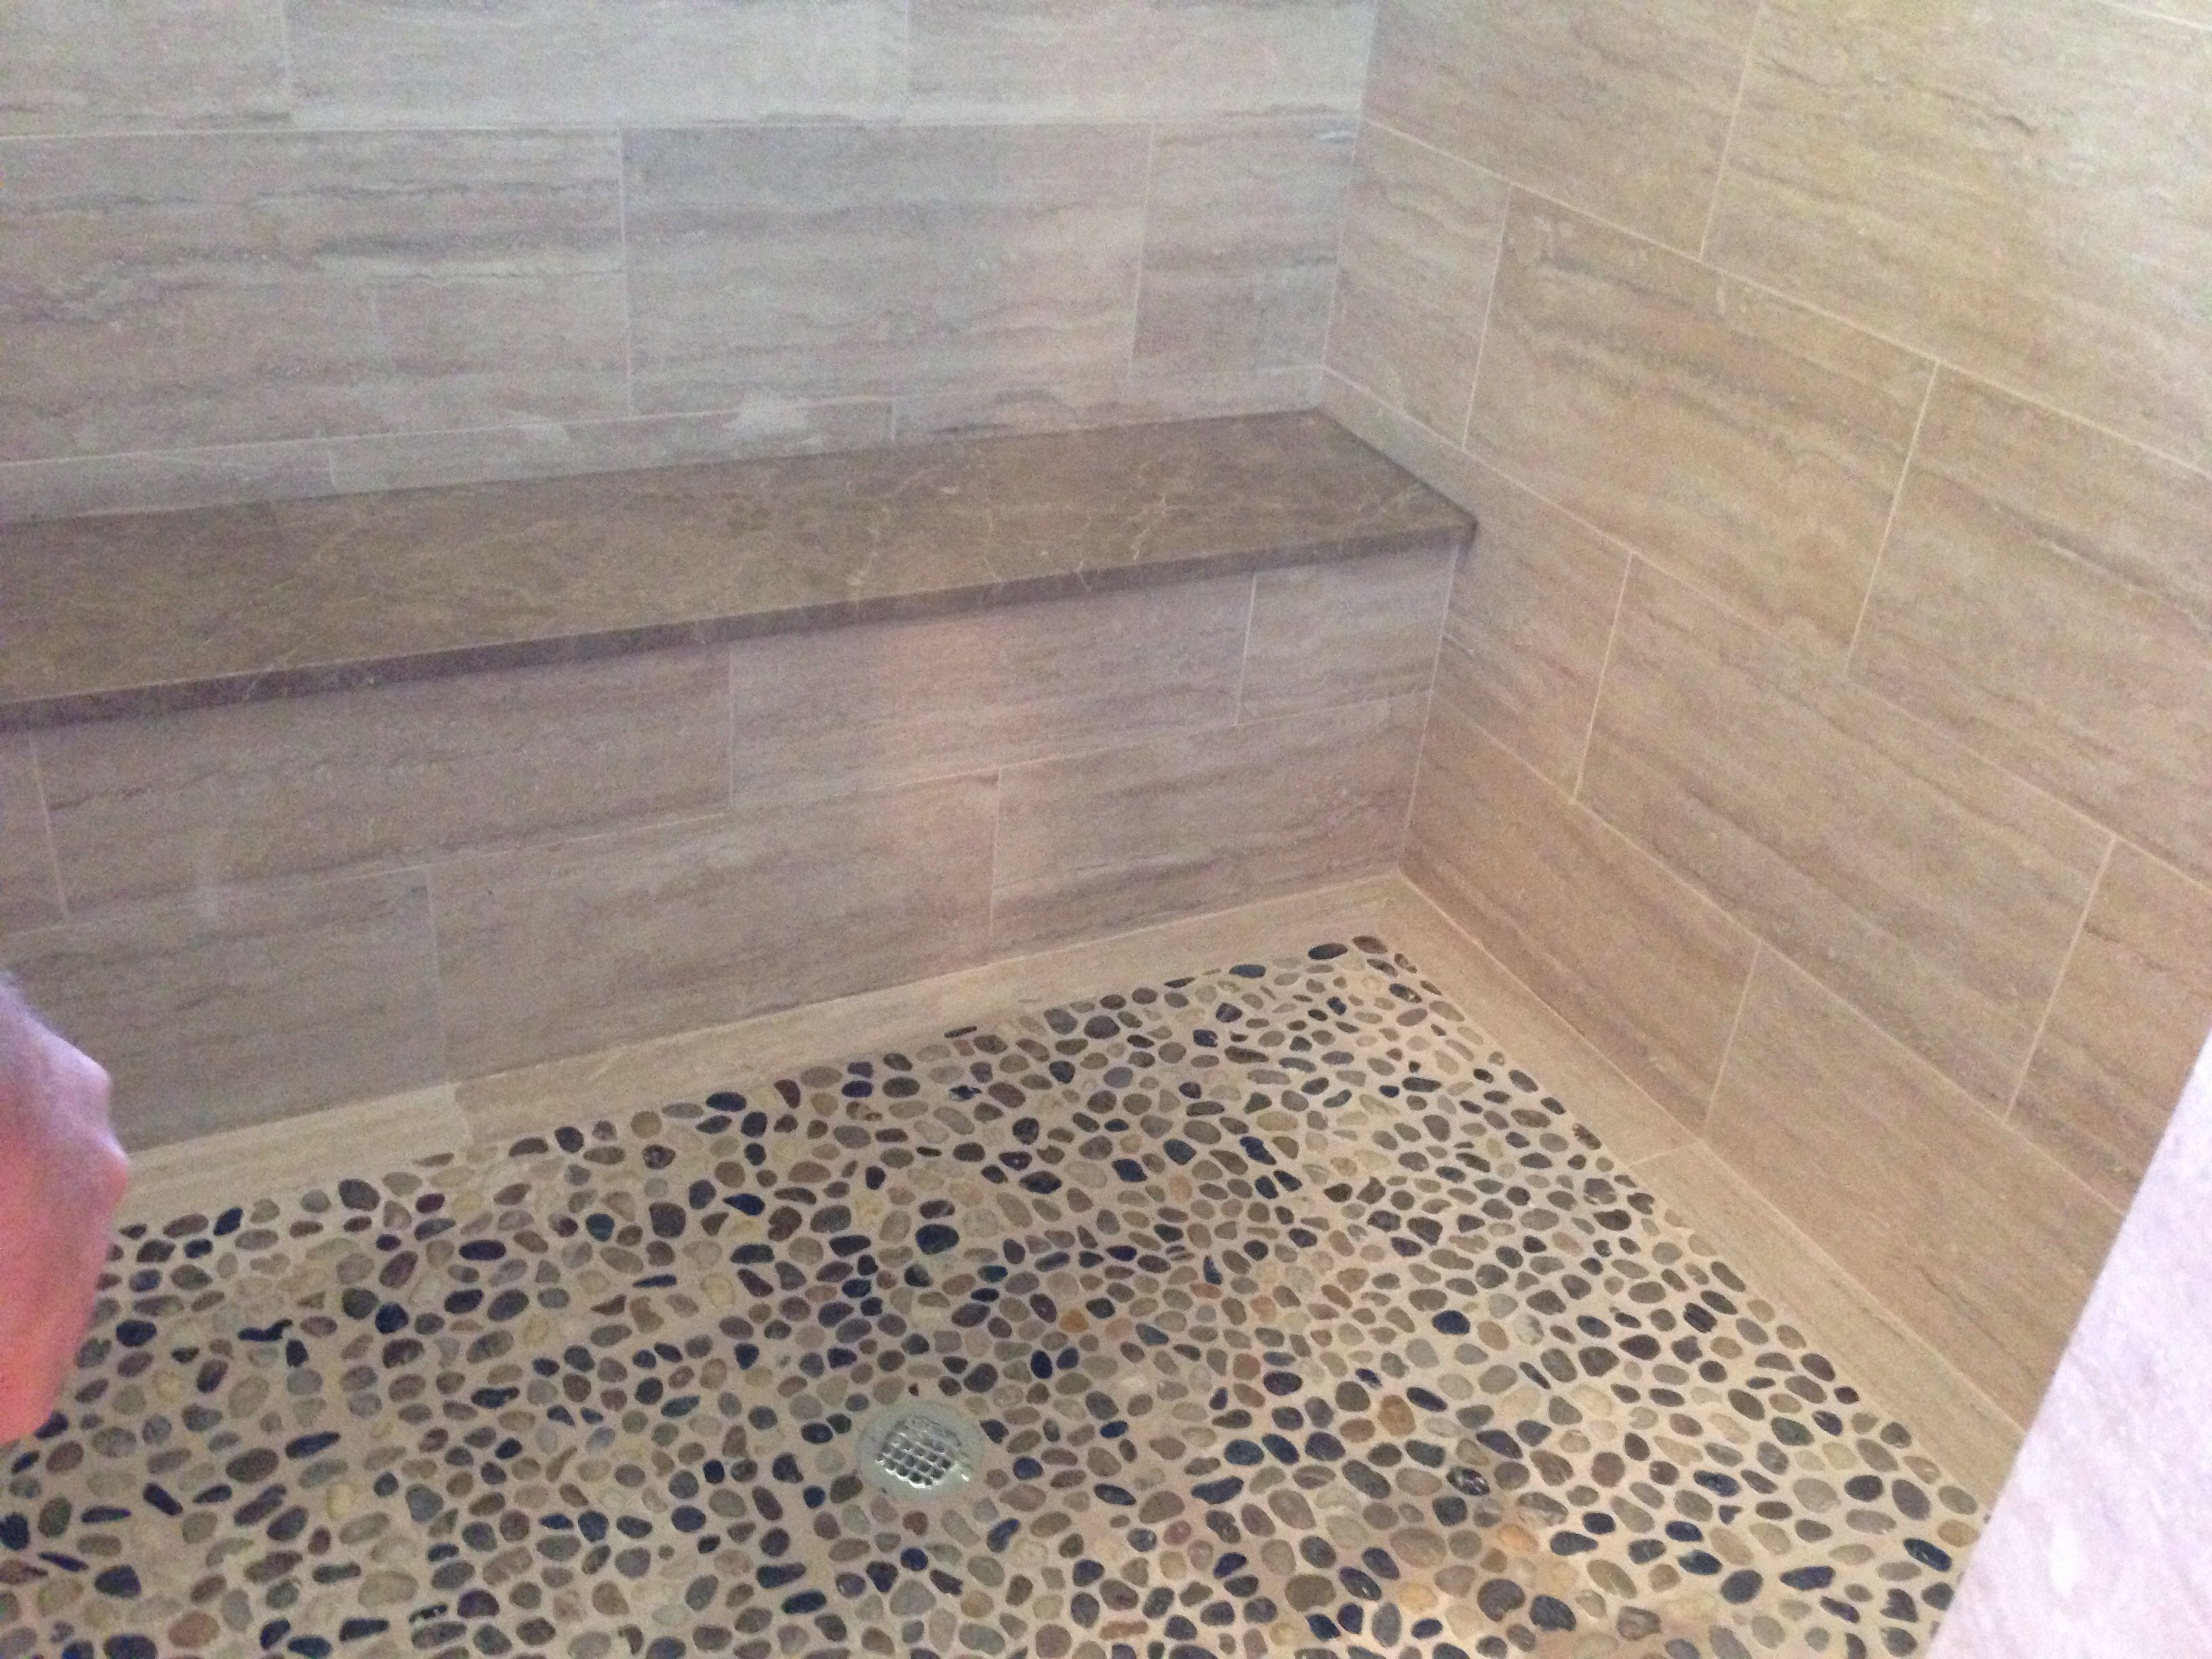 Superb Pebble Shower Floor; Shower Bench; Travertine Shower